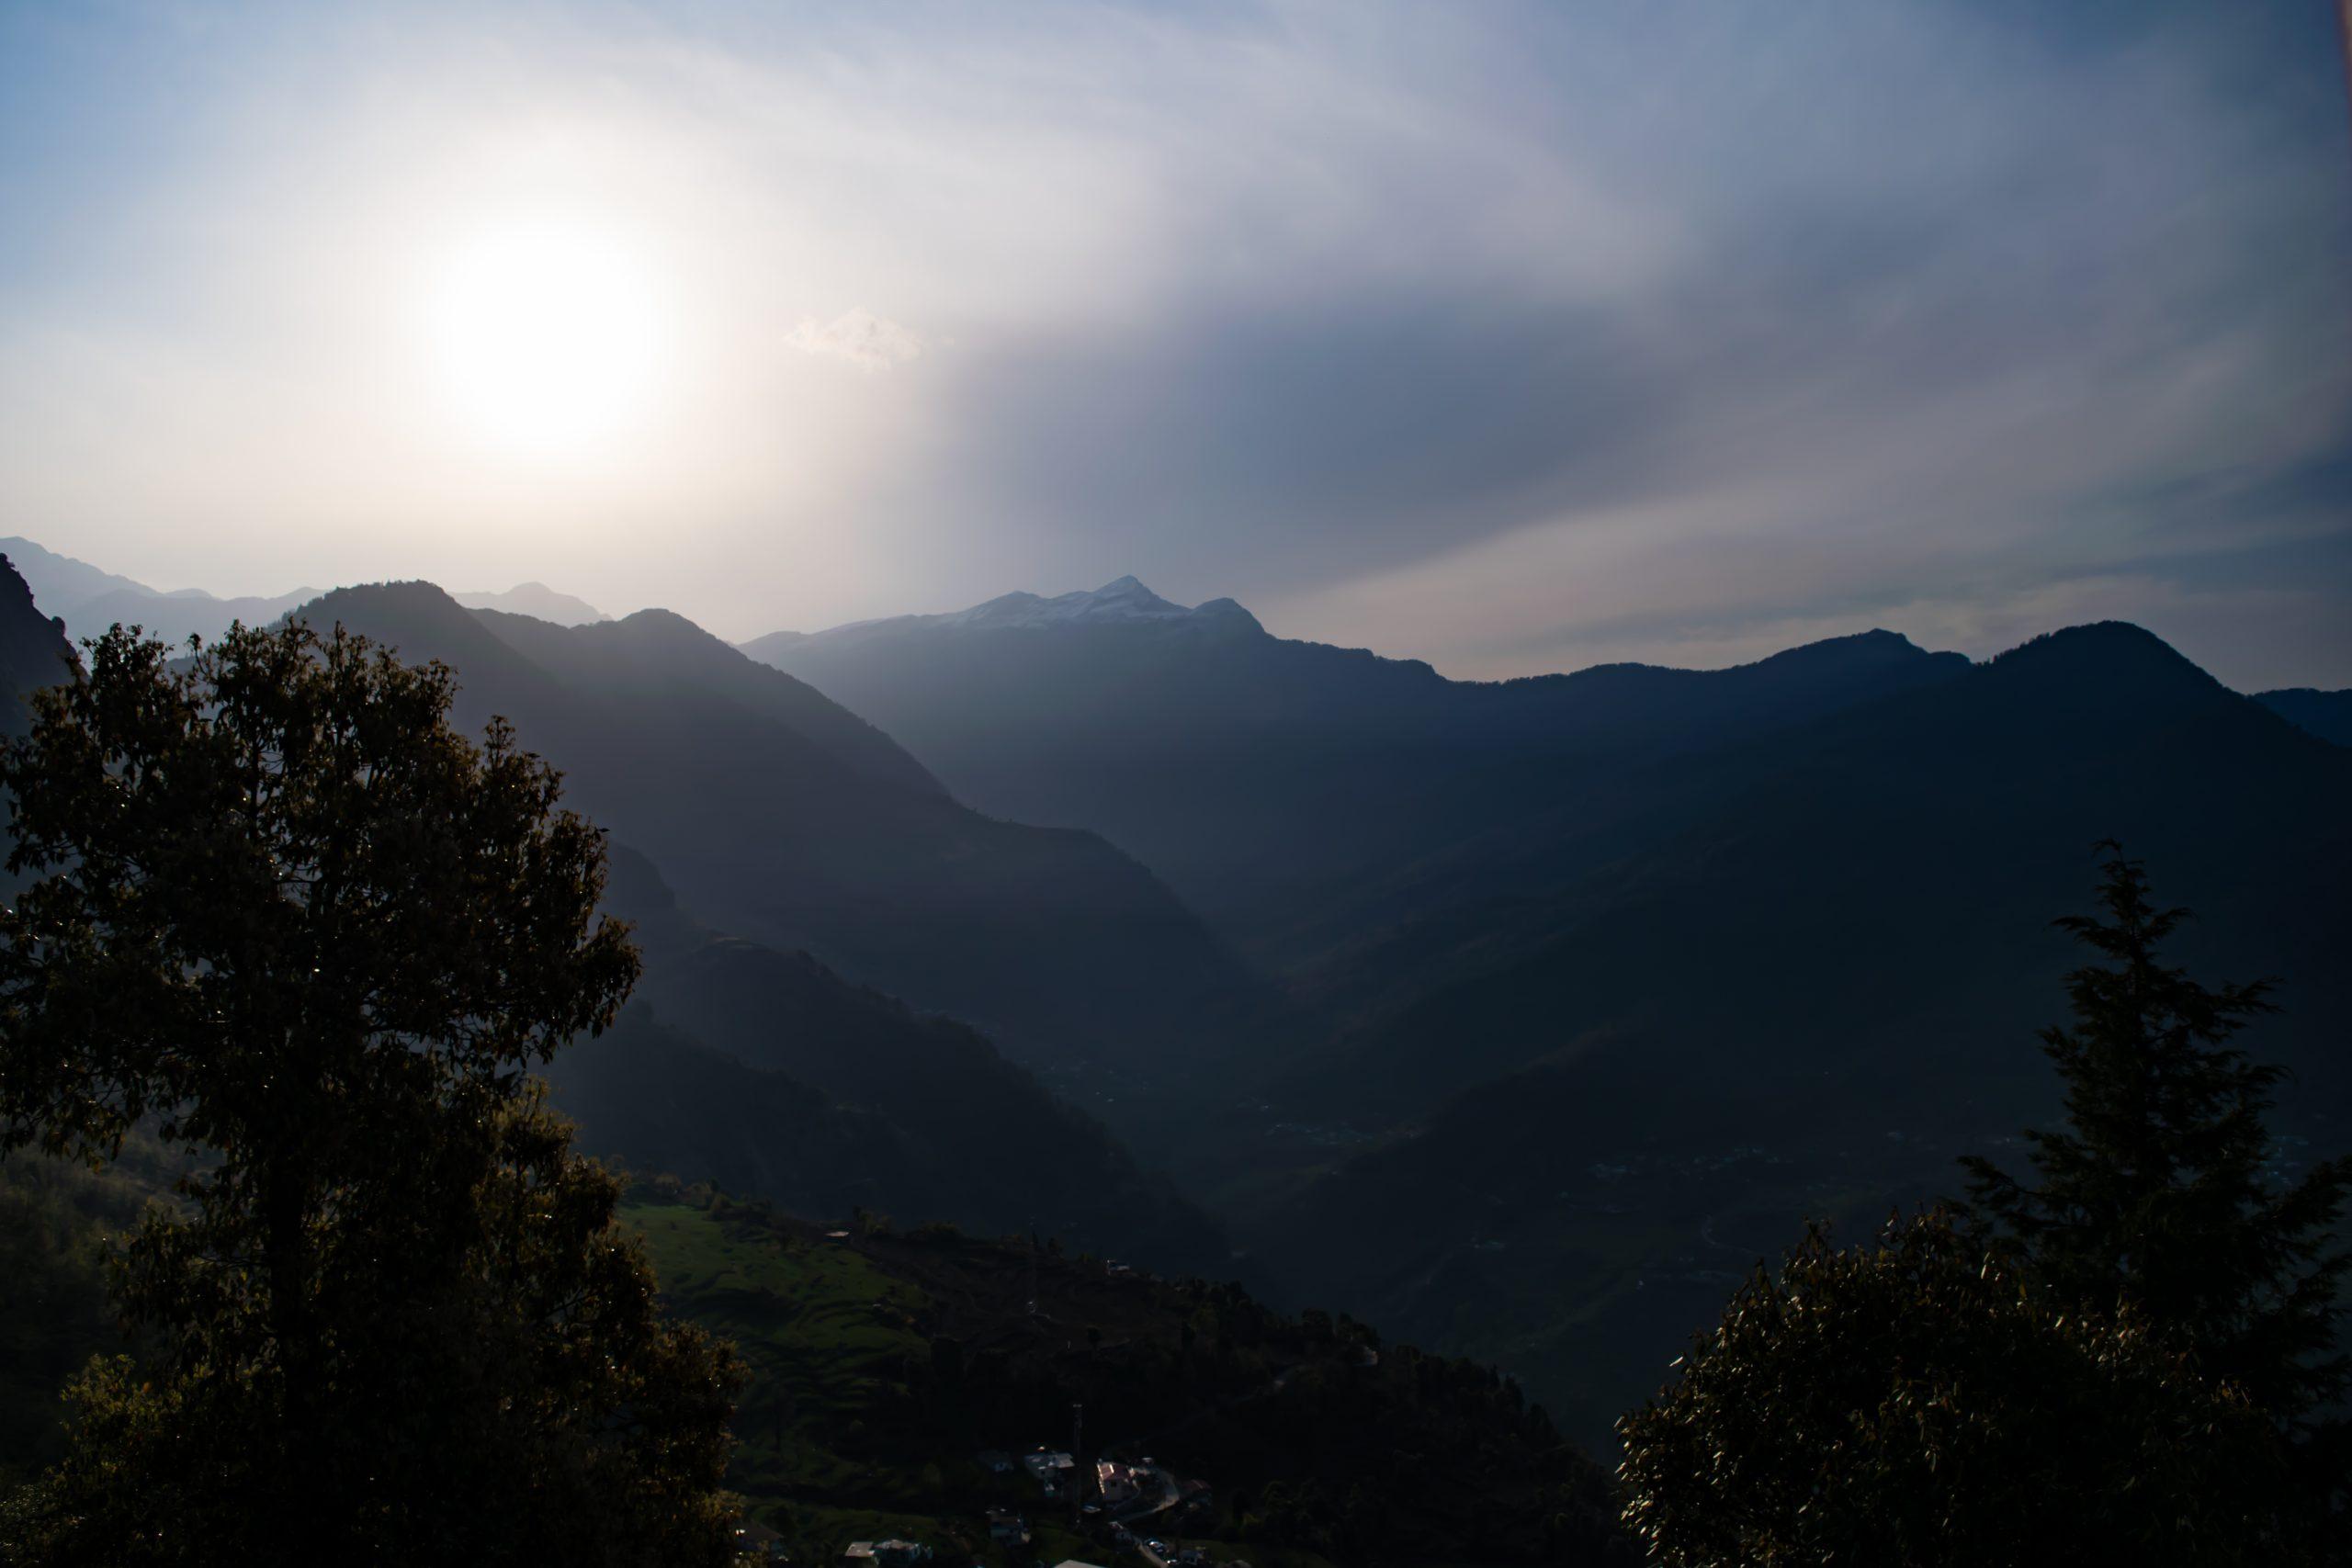 Mountain ranges of Himalaya